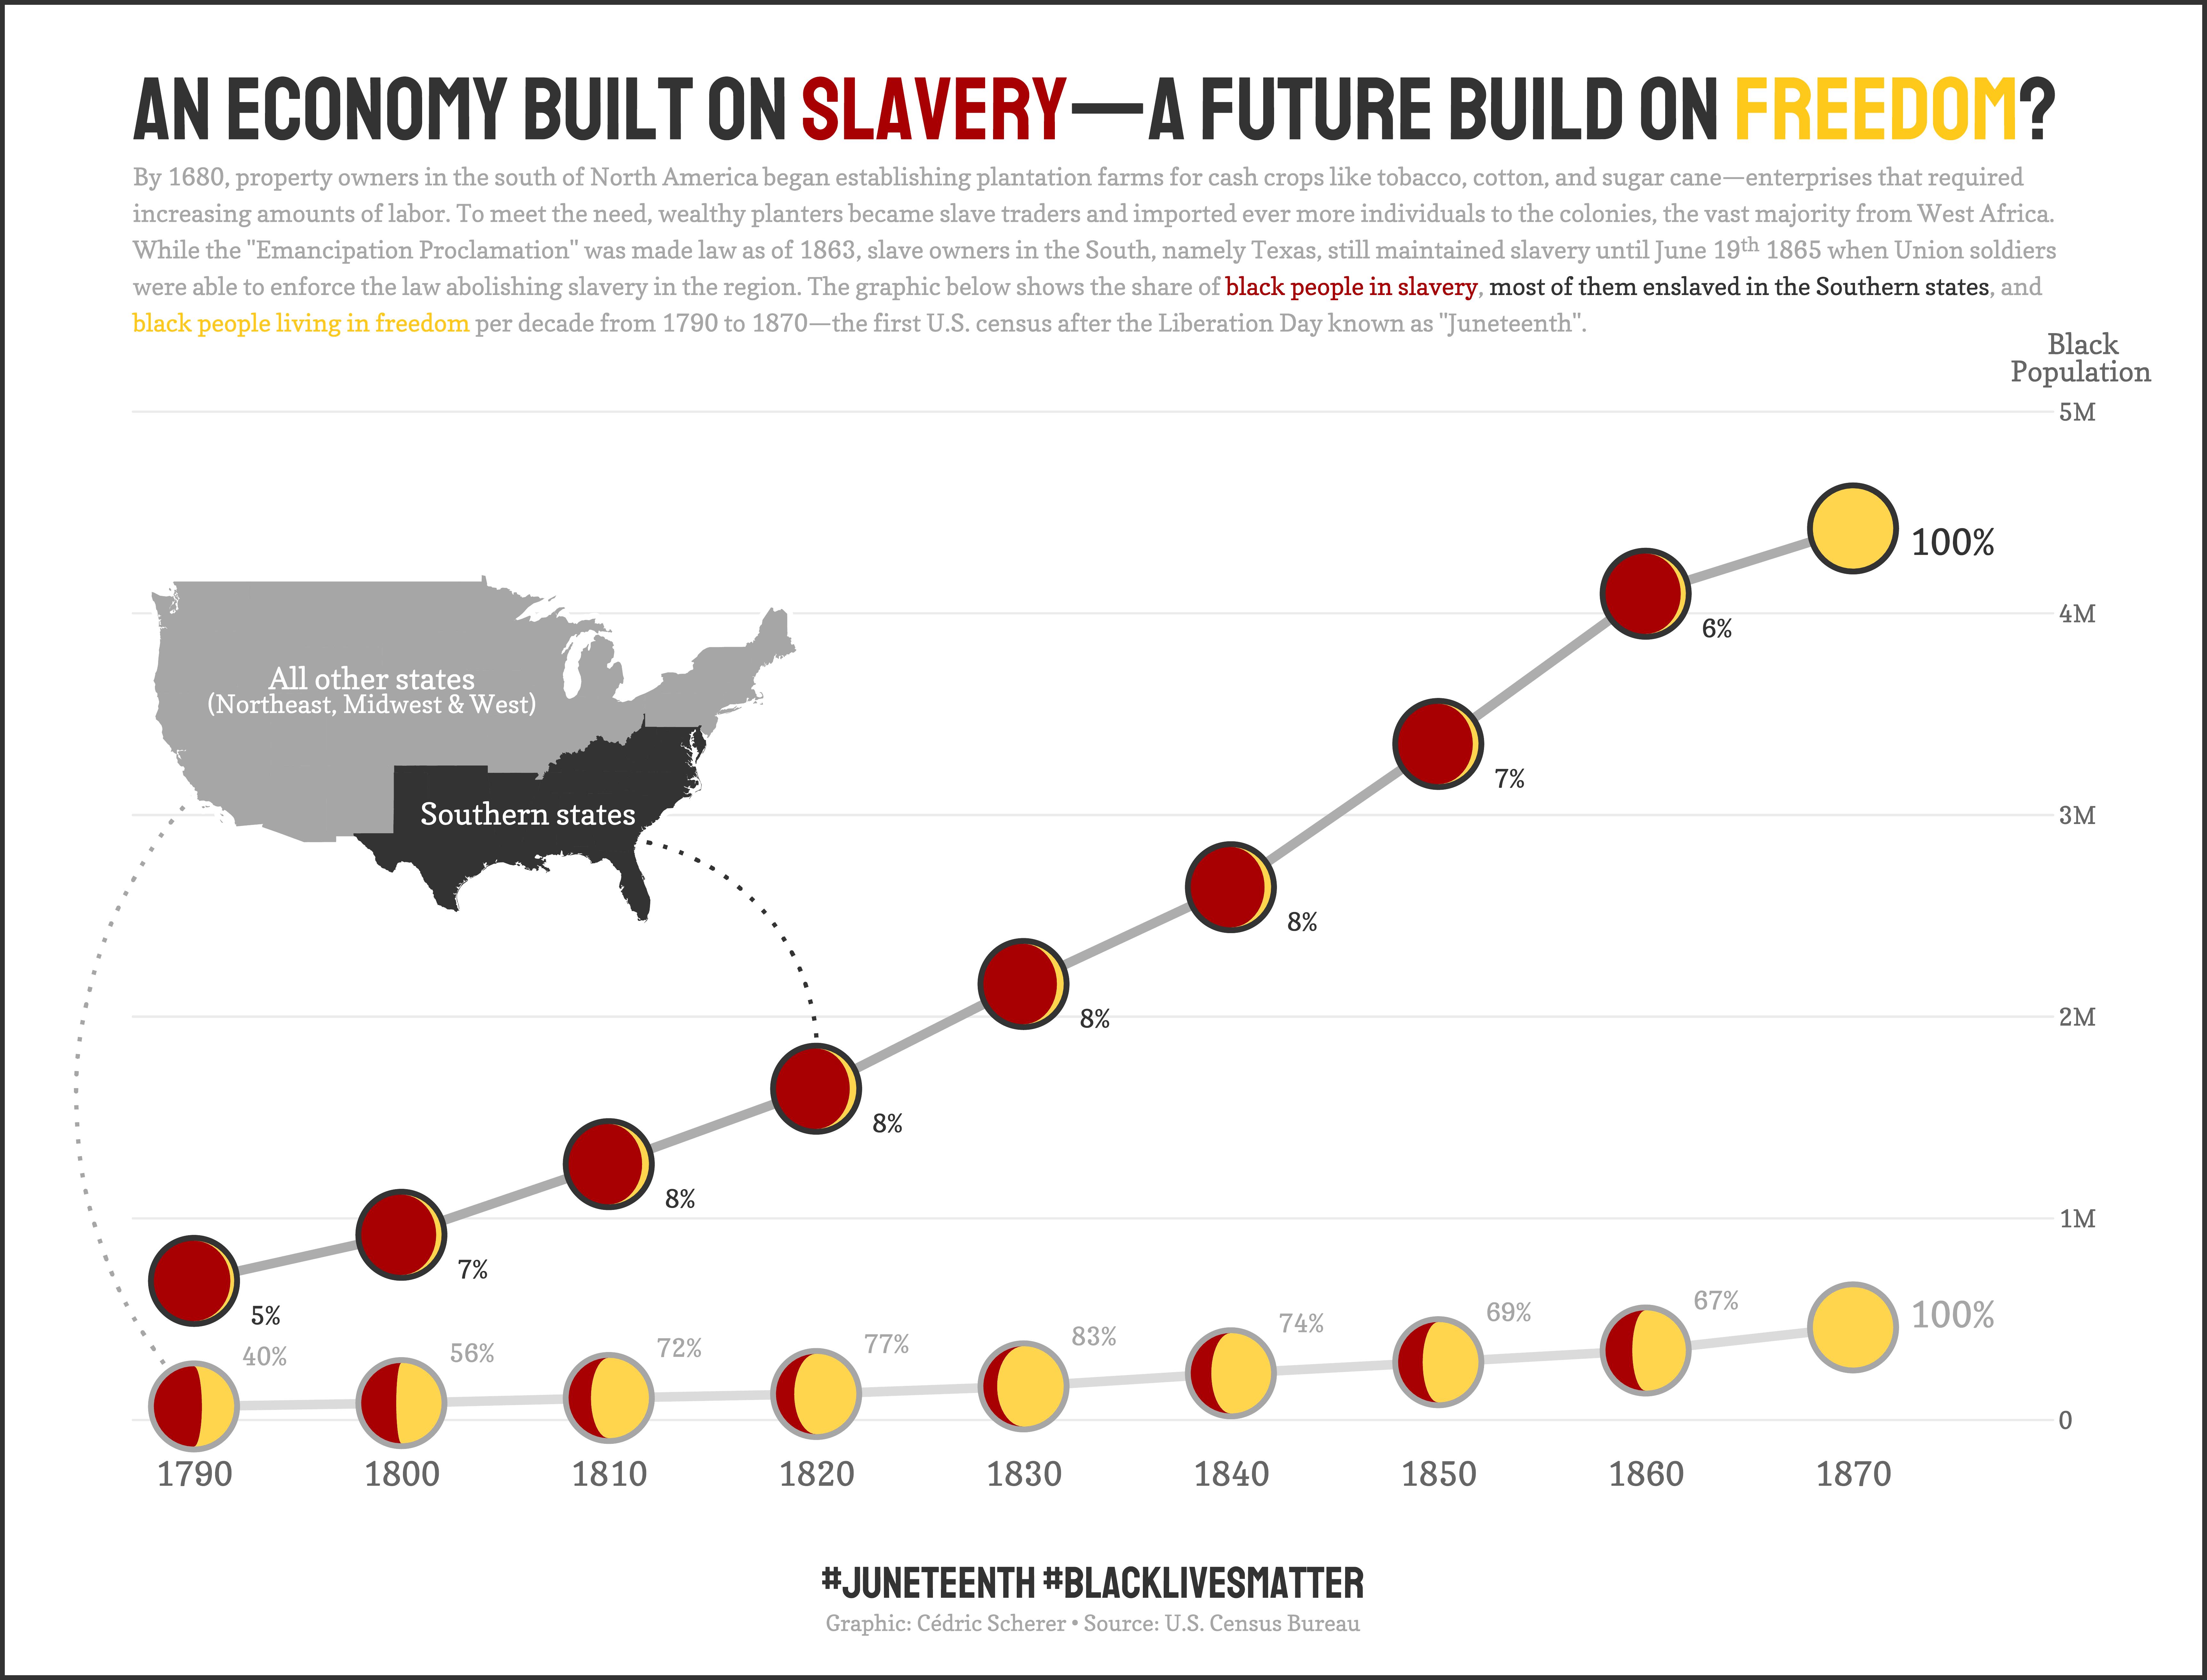 ./plots/2020_25/2020_25_AmericanSlavery.png